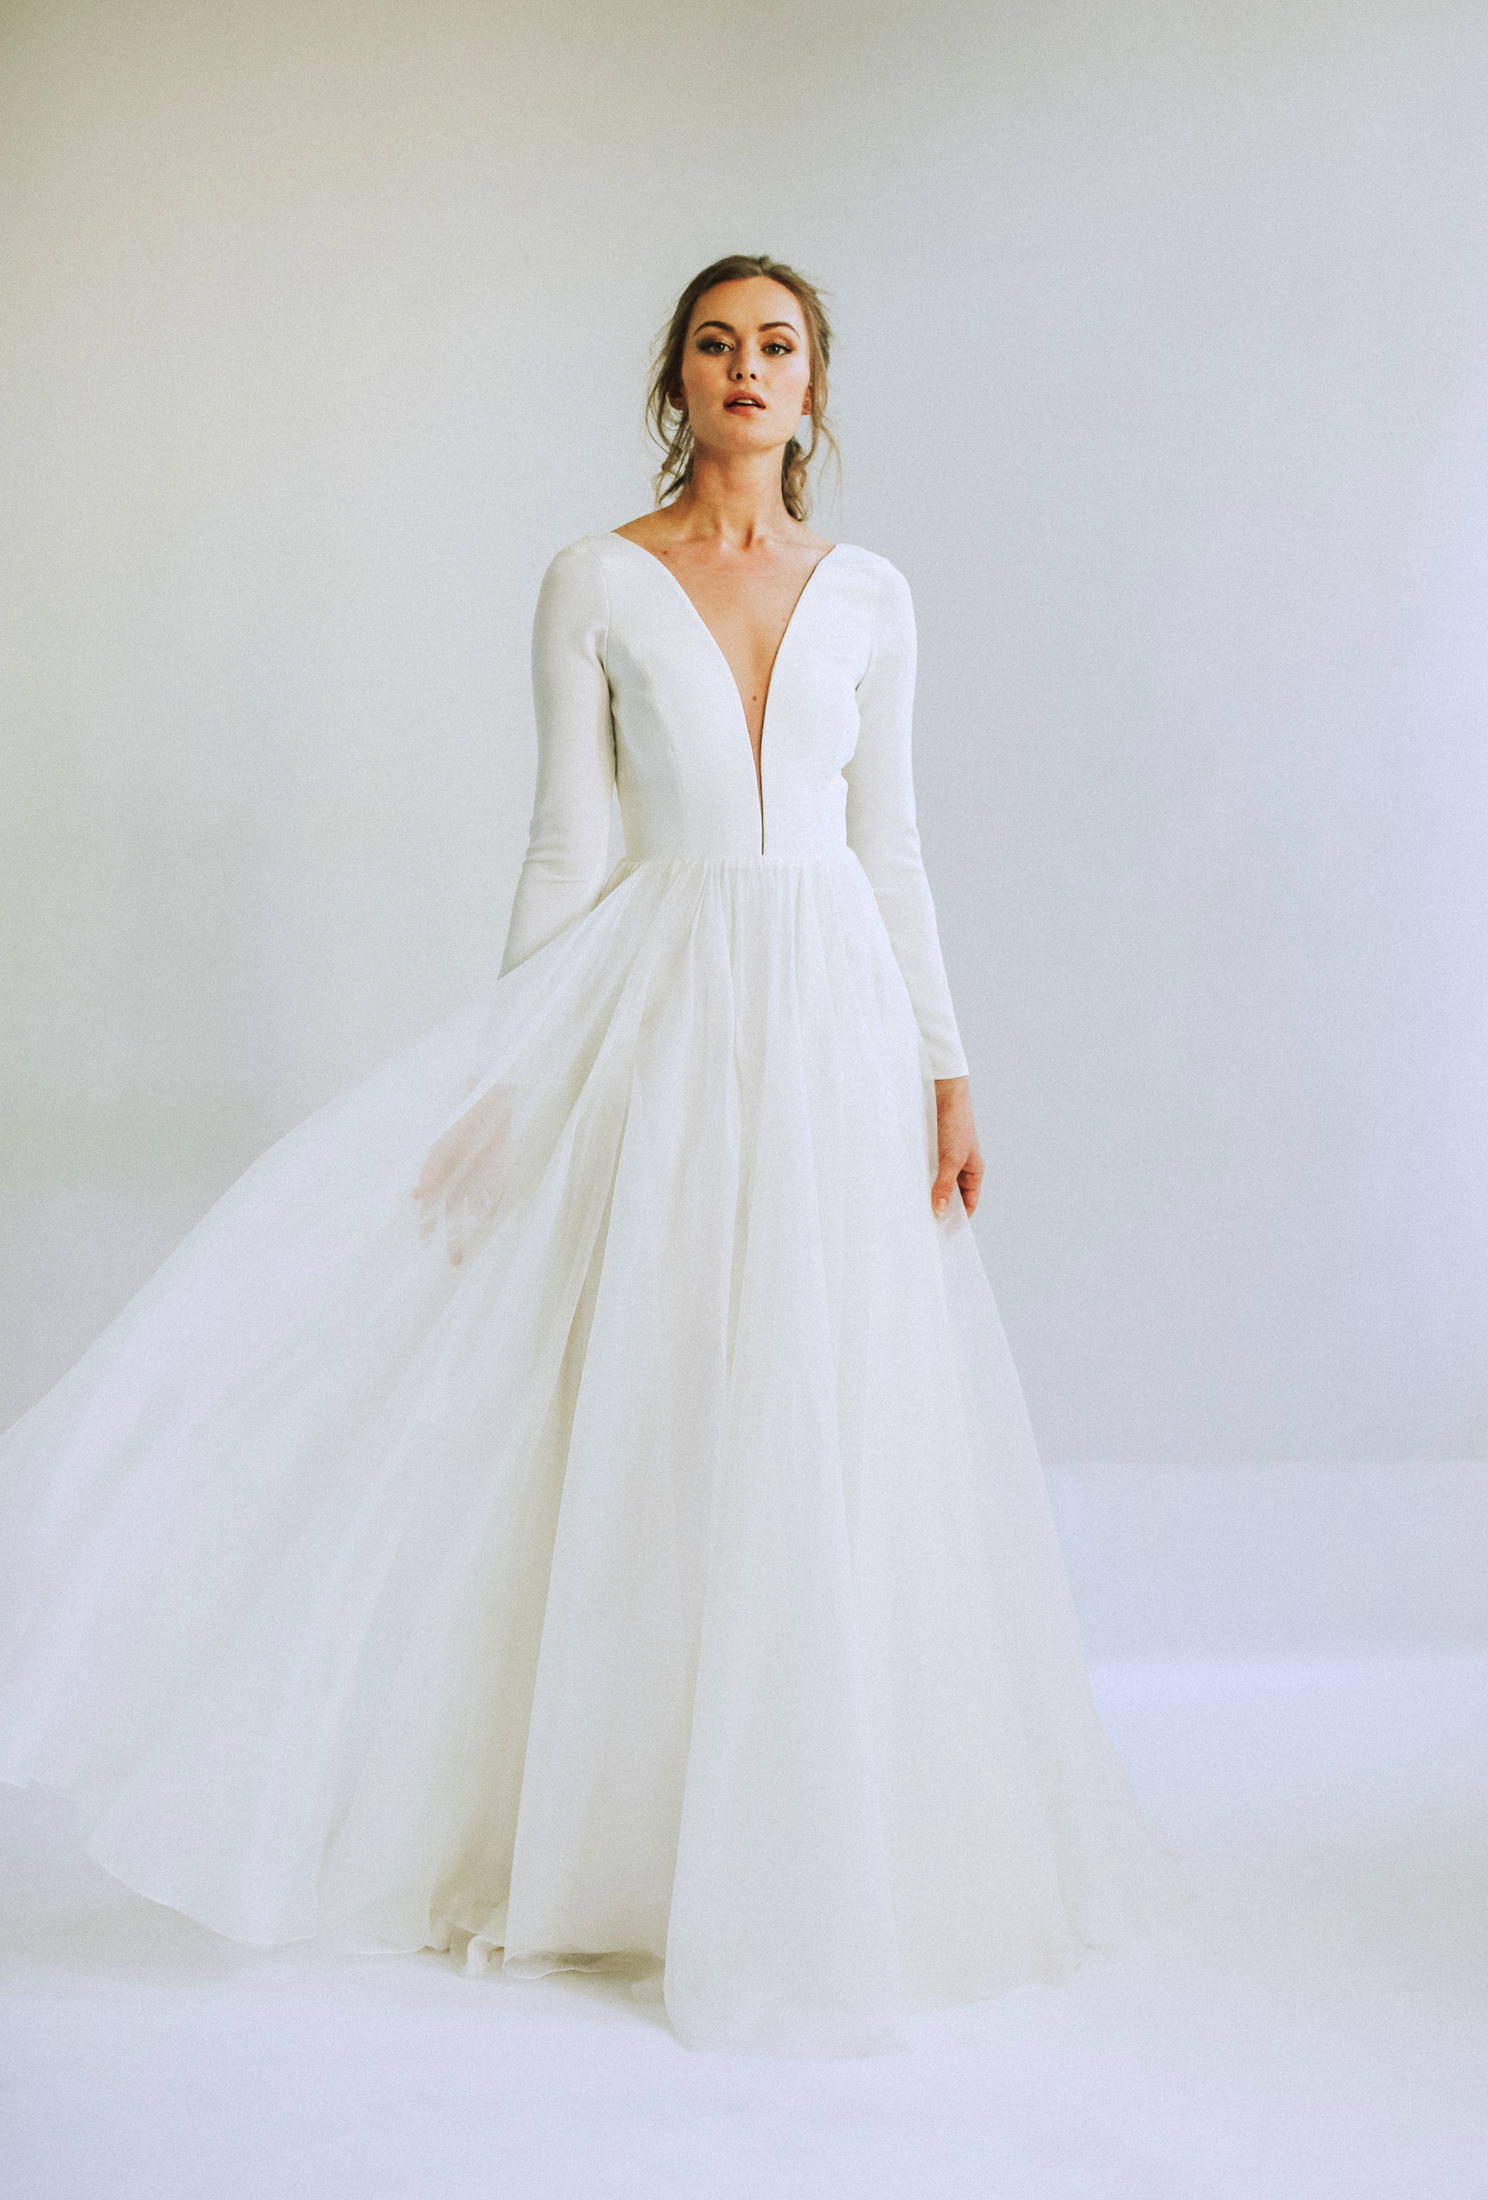 leanna marshall long sleeve deep slit bodice sheer ball gown wedding dress spring 2020